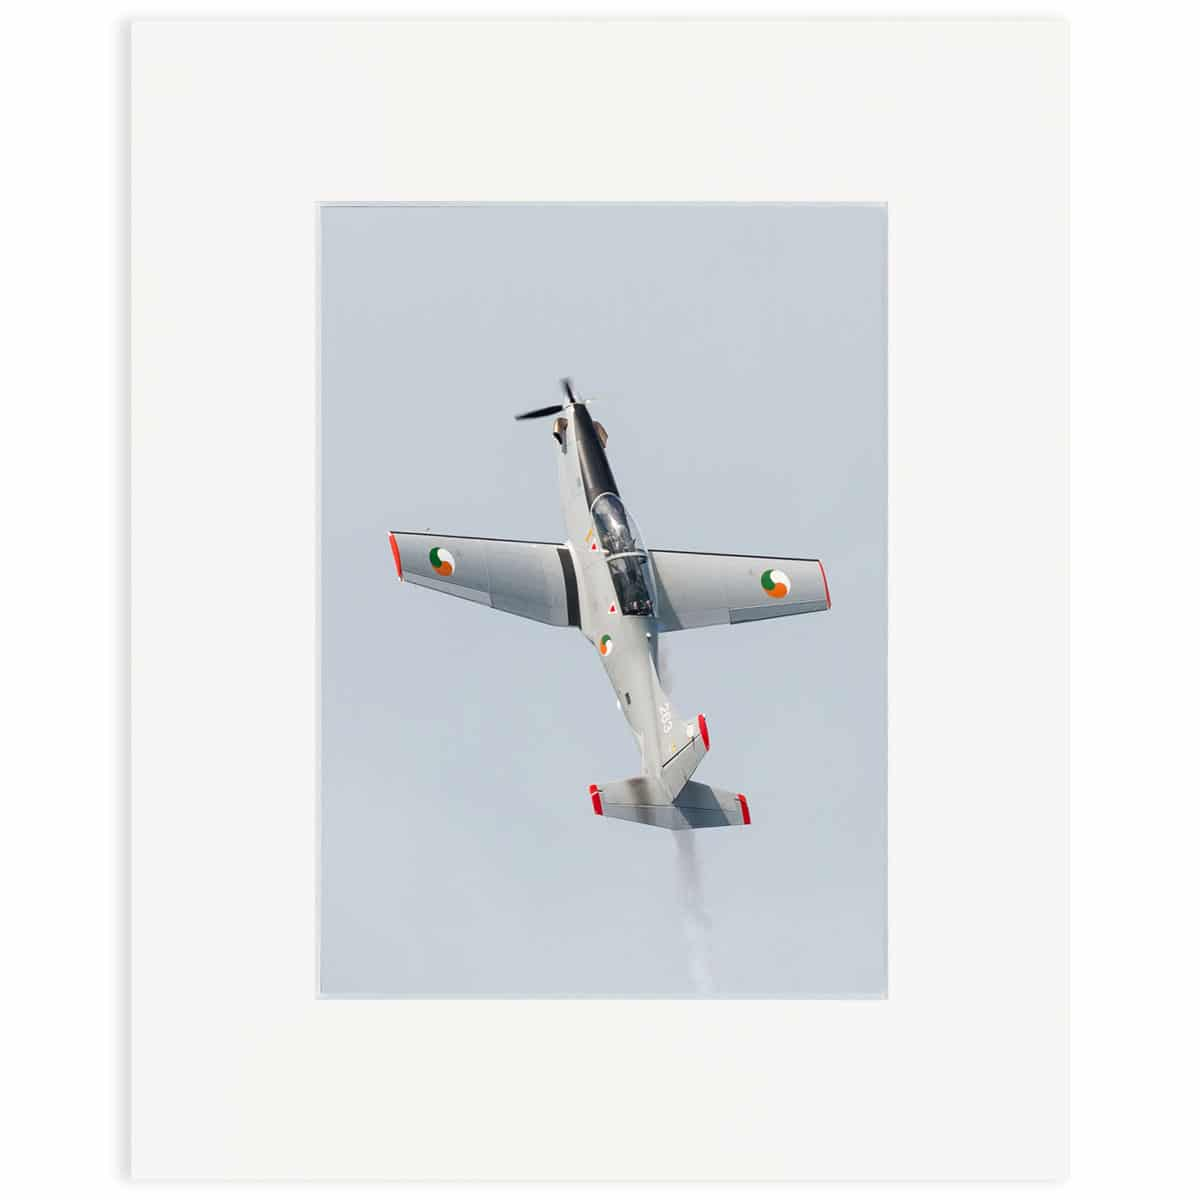 "Pilatus PC9M 8"" x 10"" print"